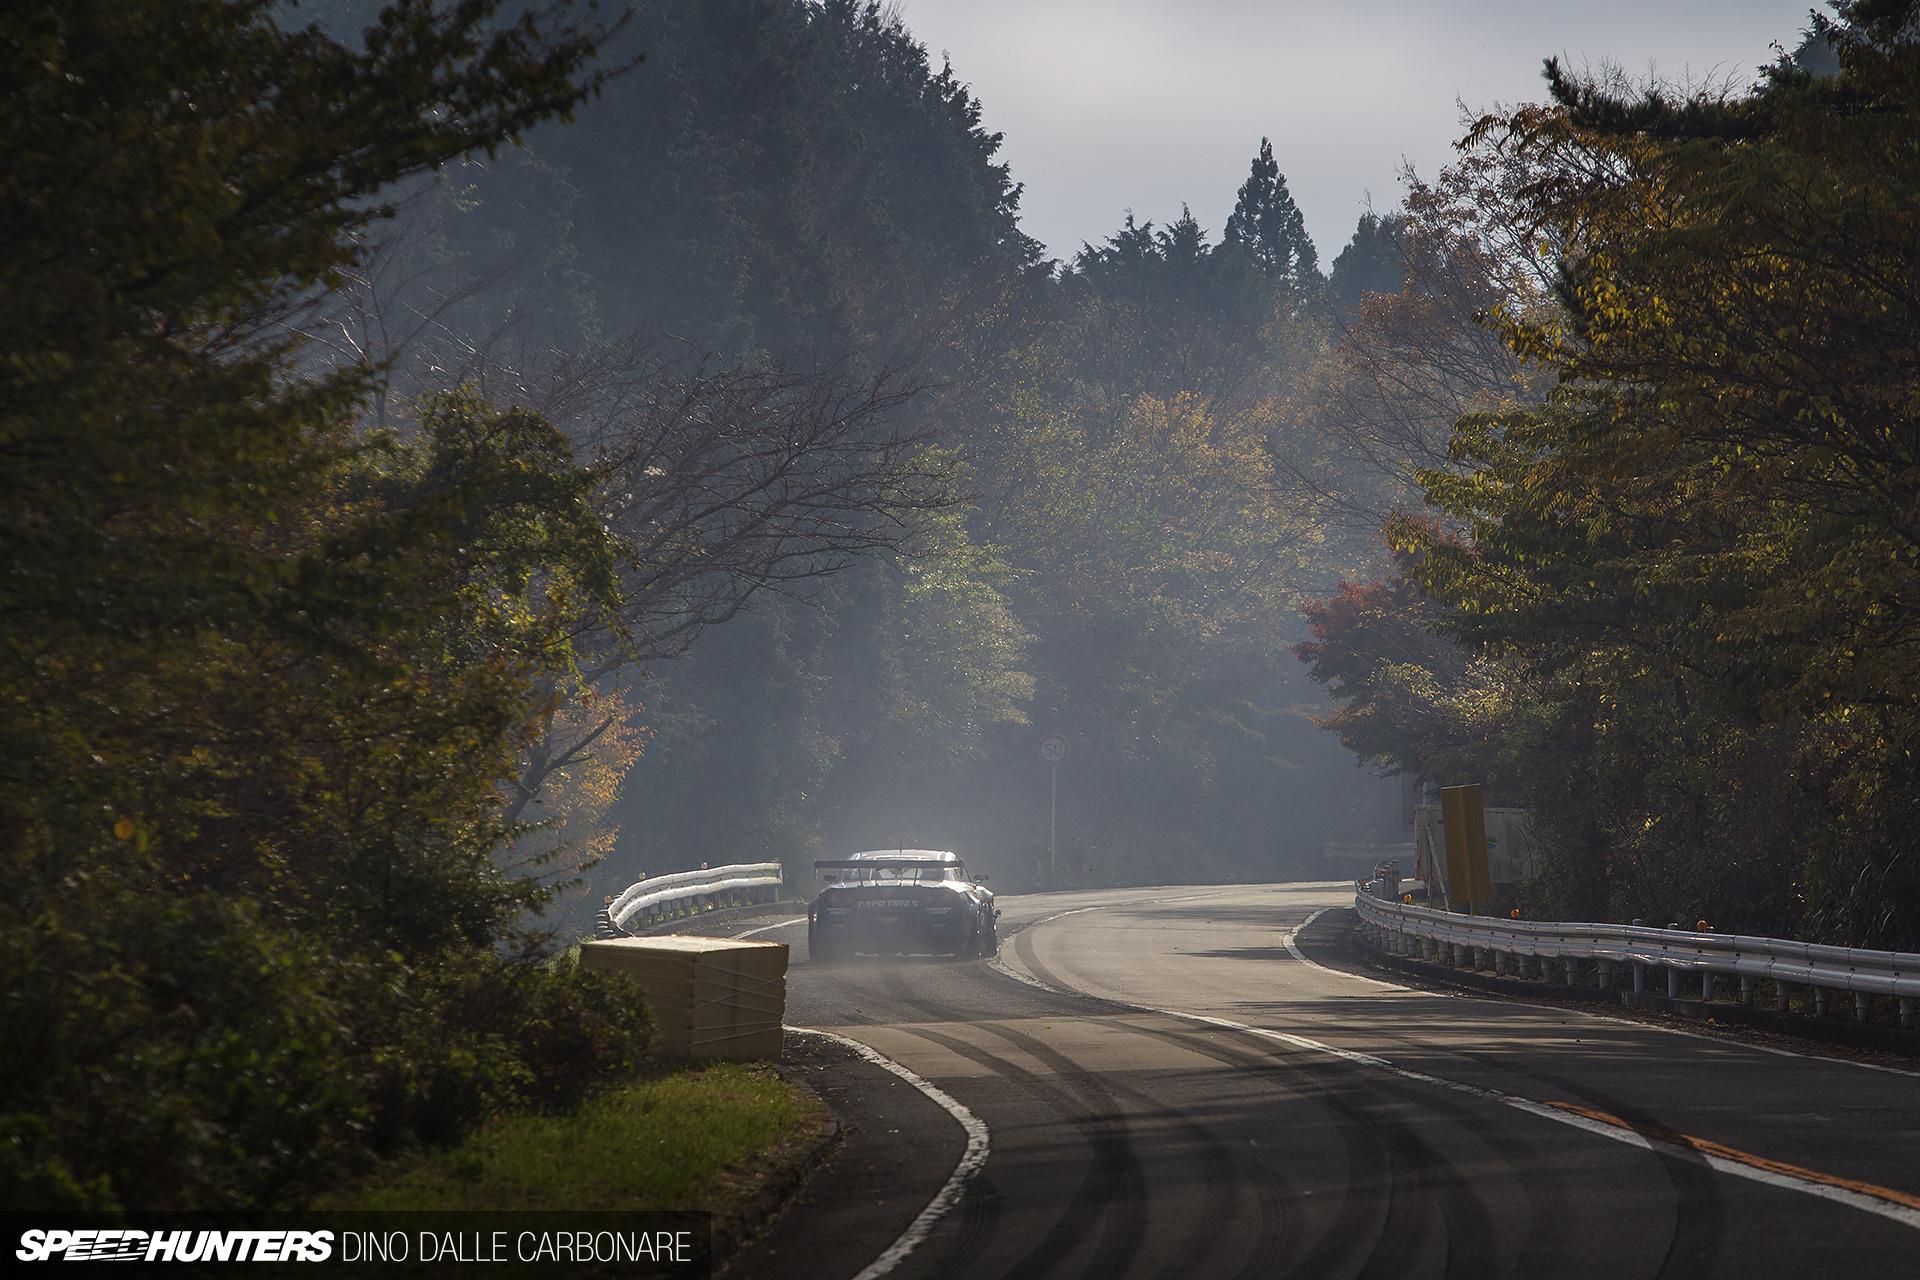 Hd Classic Muscle Car Wallpapers Climbing The Hakone Turnpike Speedhunters